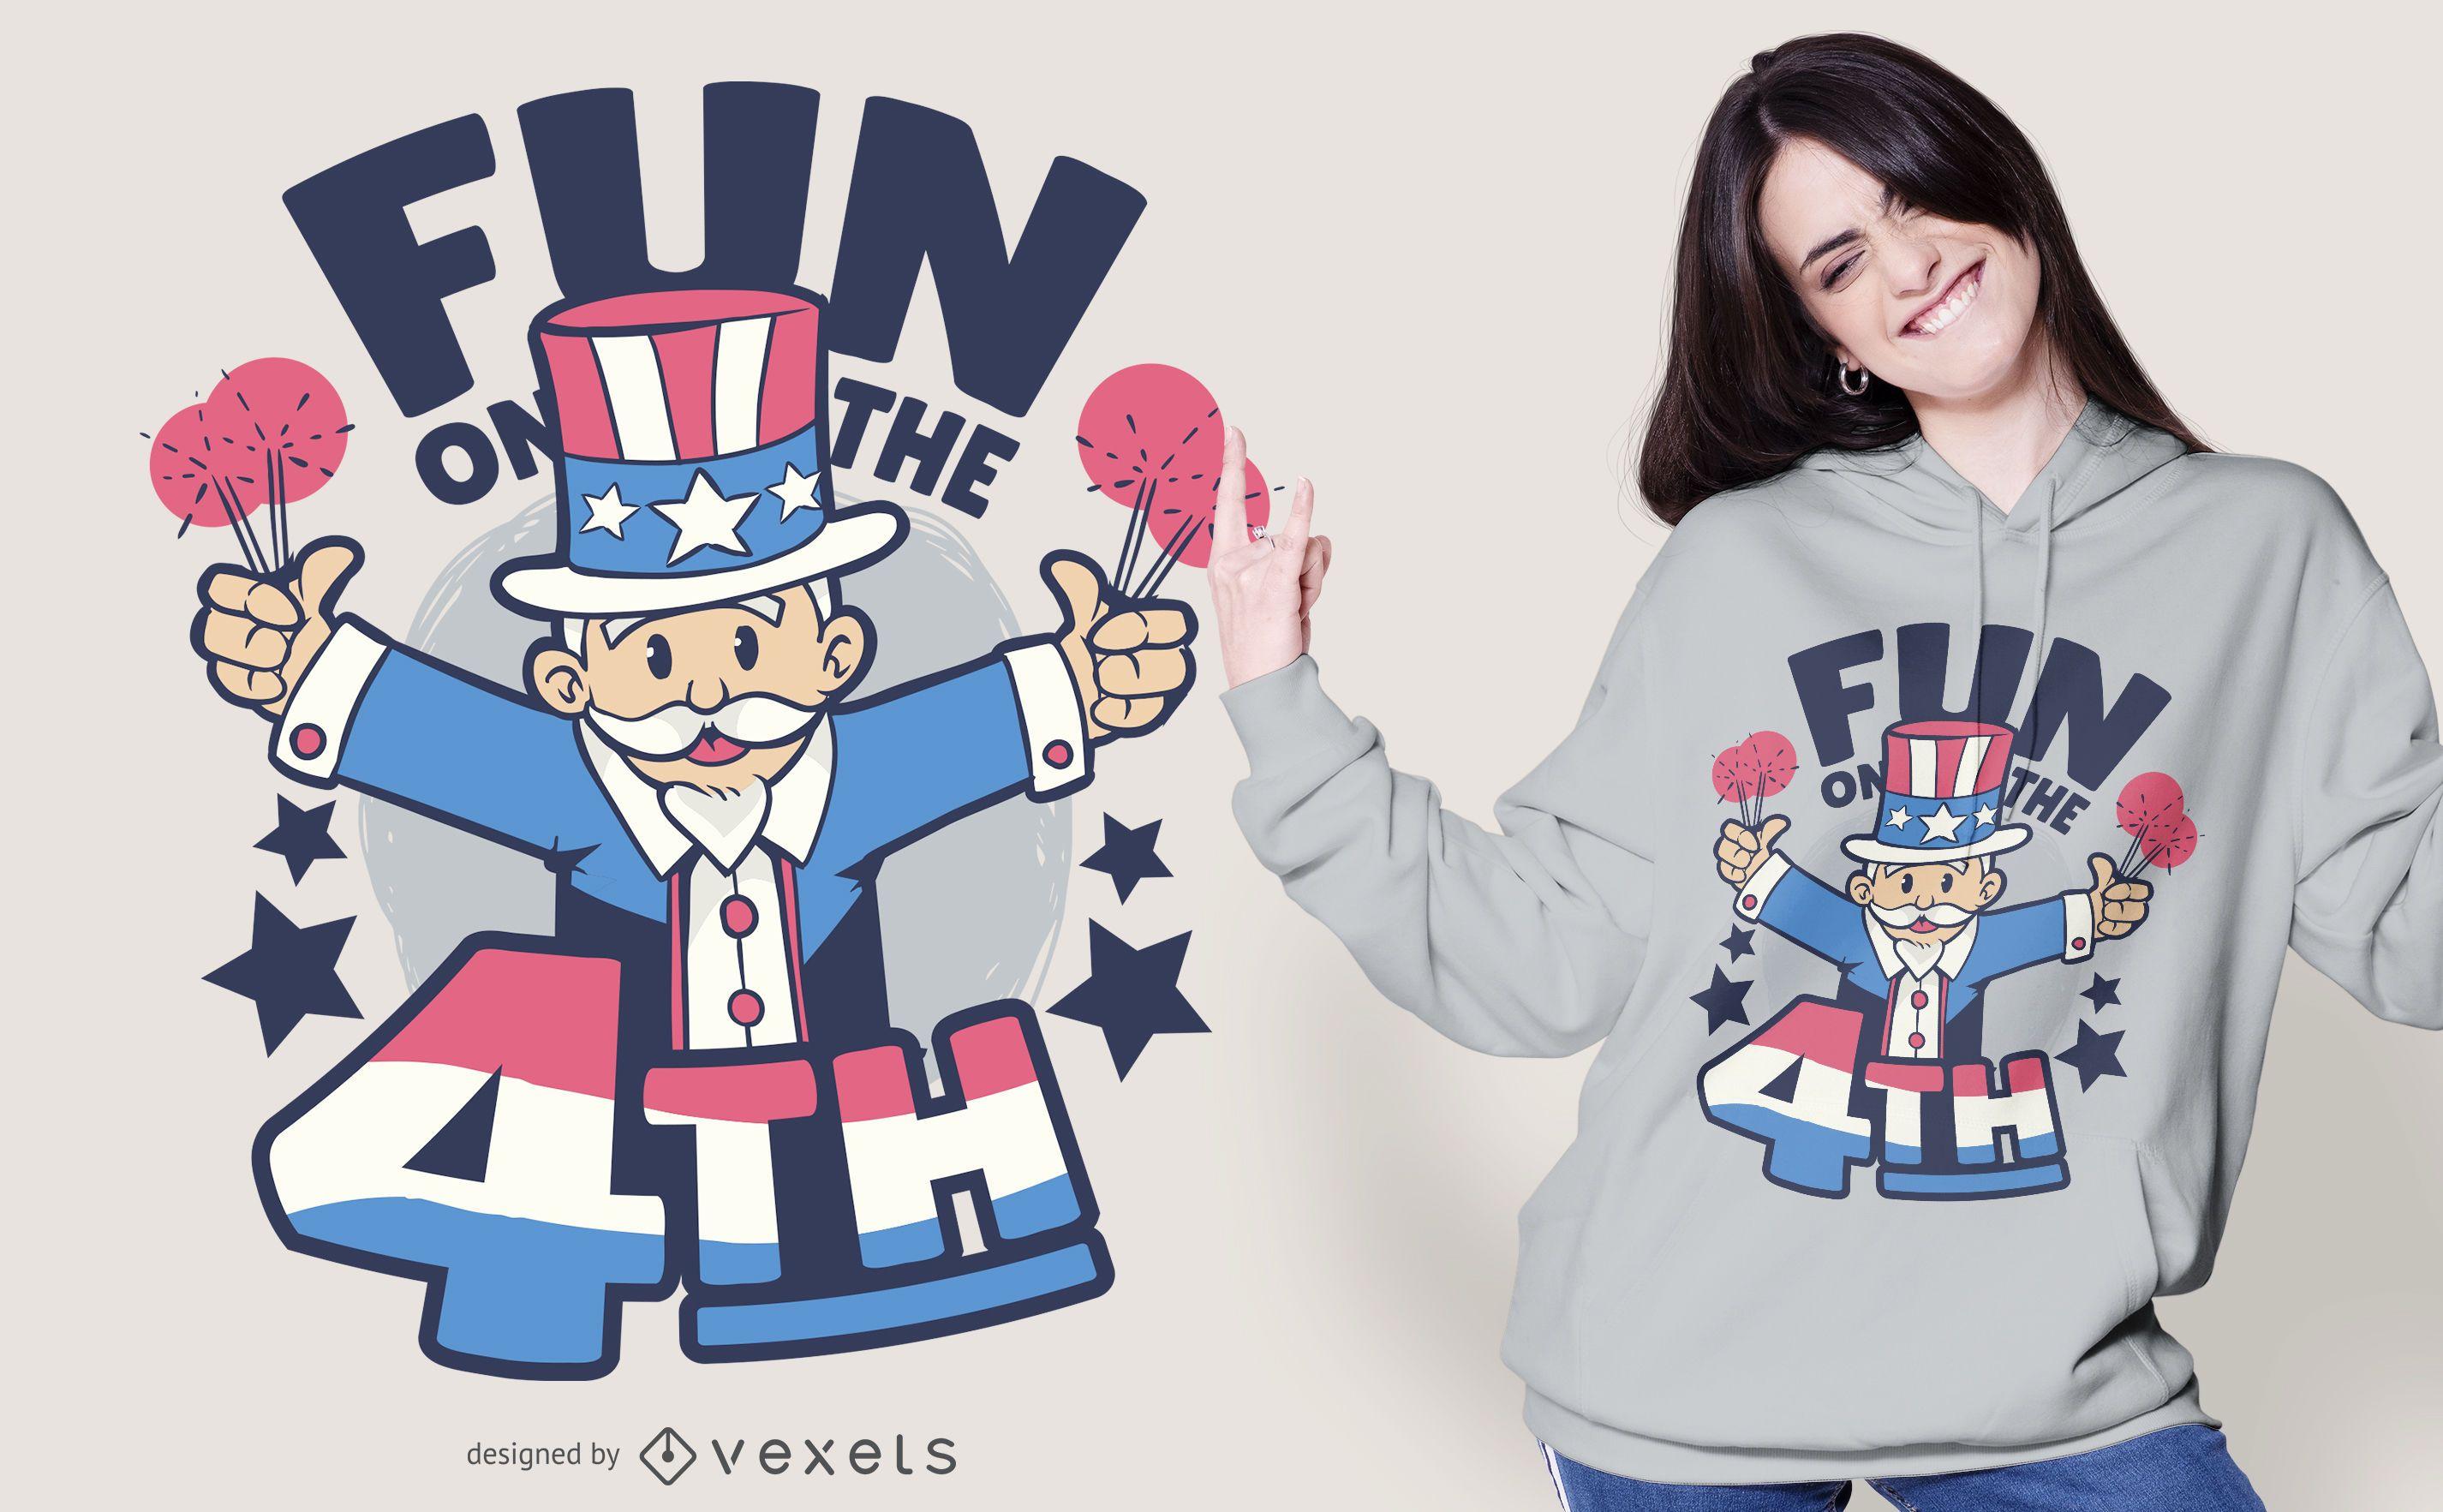 Fun on the 4th July T-shirt Design